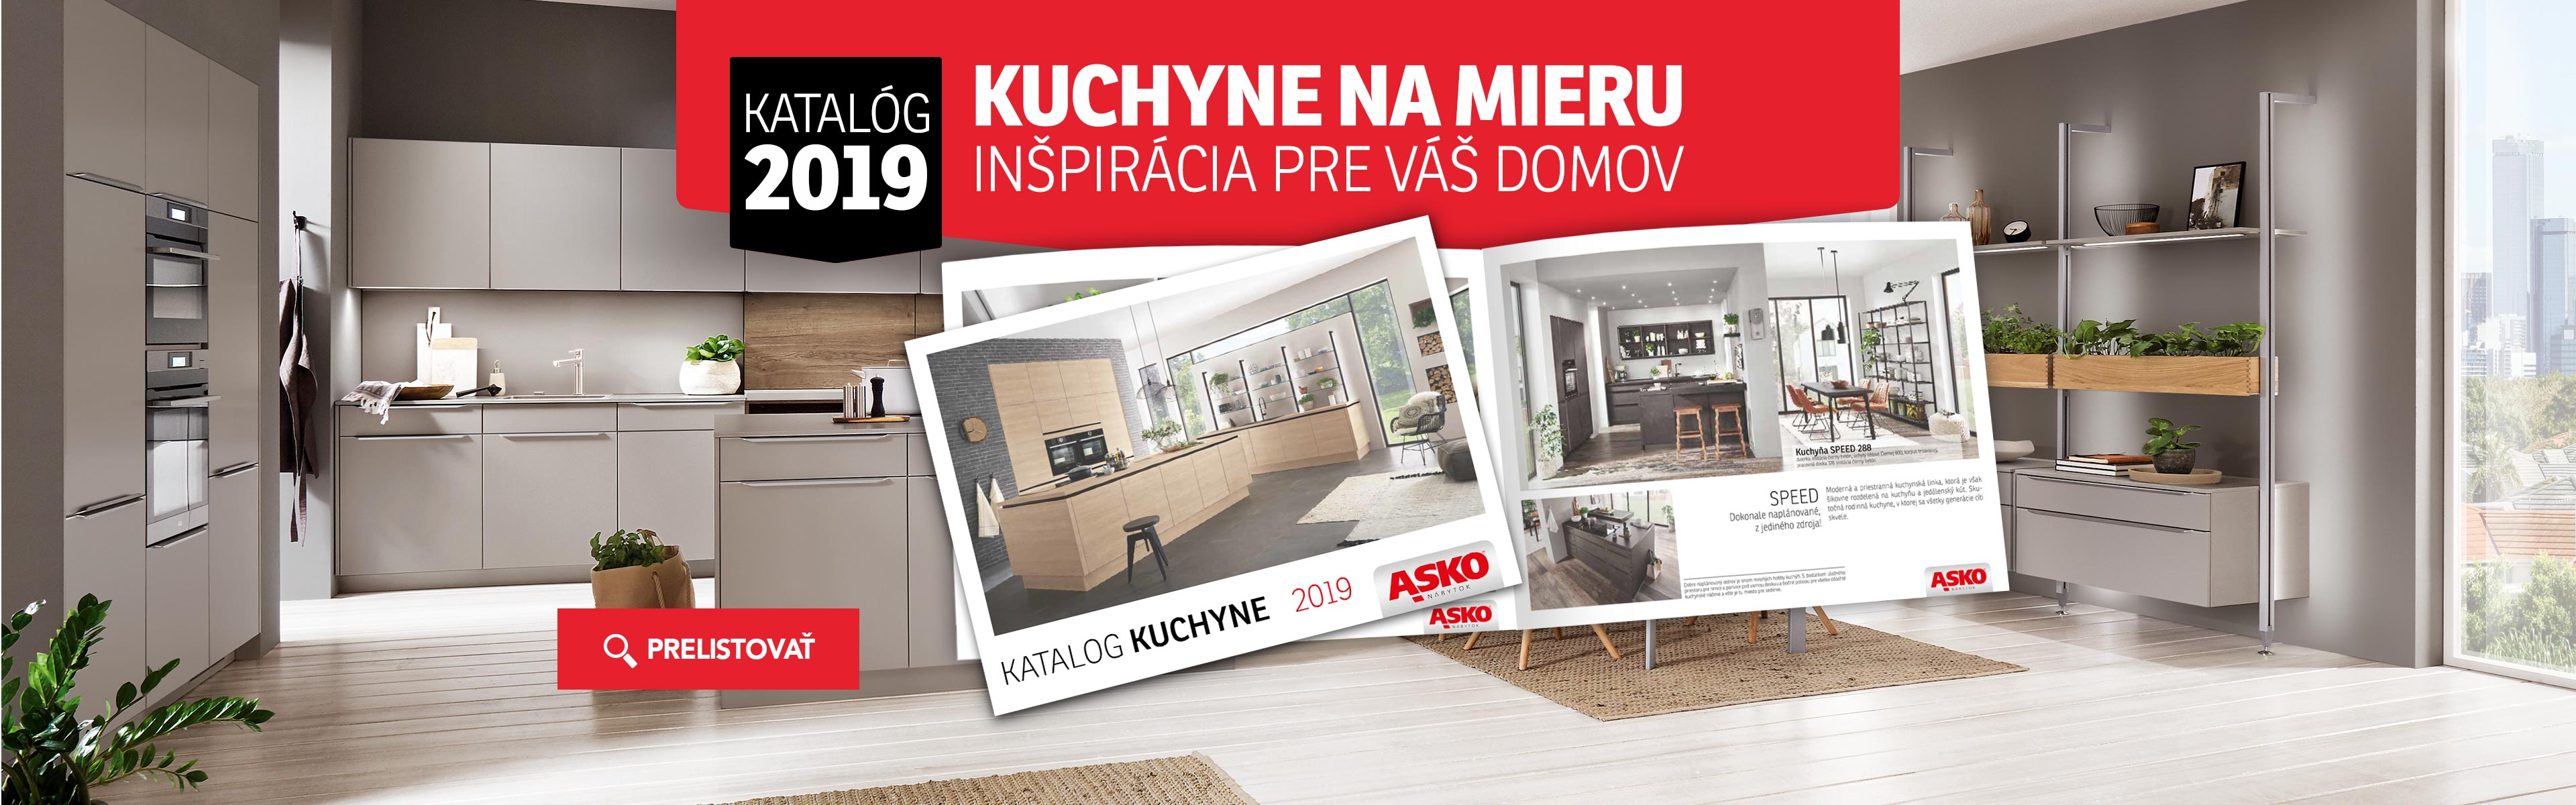 KUCHYNE - Katalog Kuchyně 2019